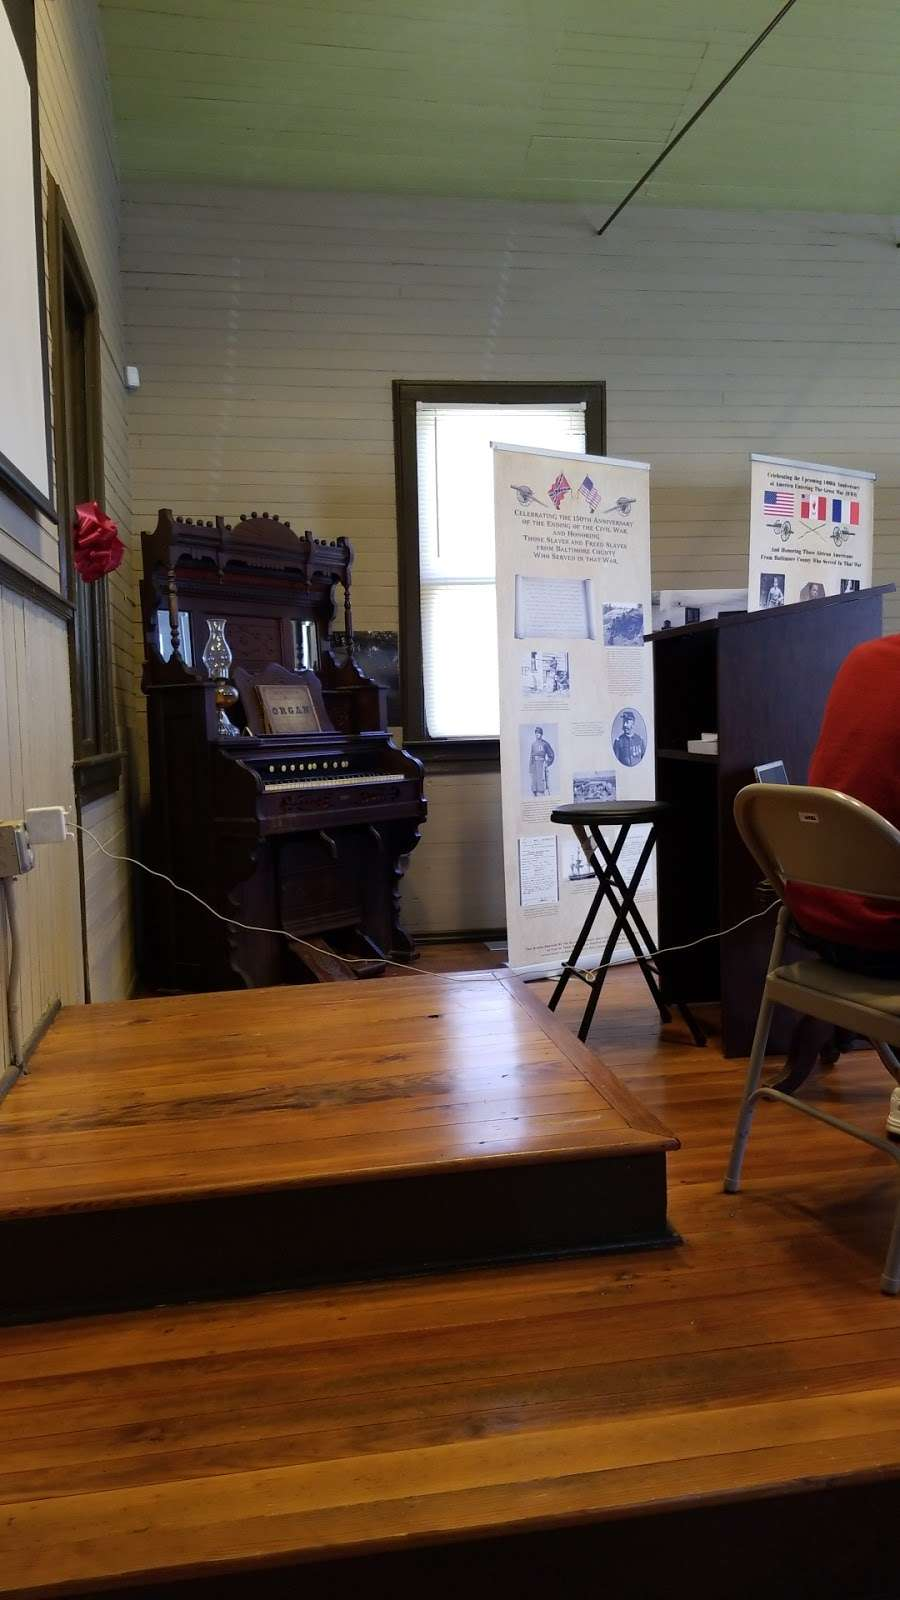 Diggs Johnson Museum - museum  | Photo 4 of 5 | Address: 2426 Offutt Rd, Woodstock, MD 21163, USA | Phone: (443) 675-7282